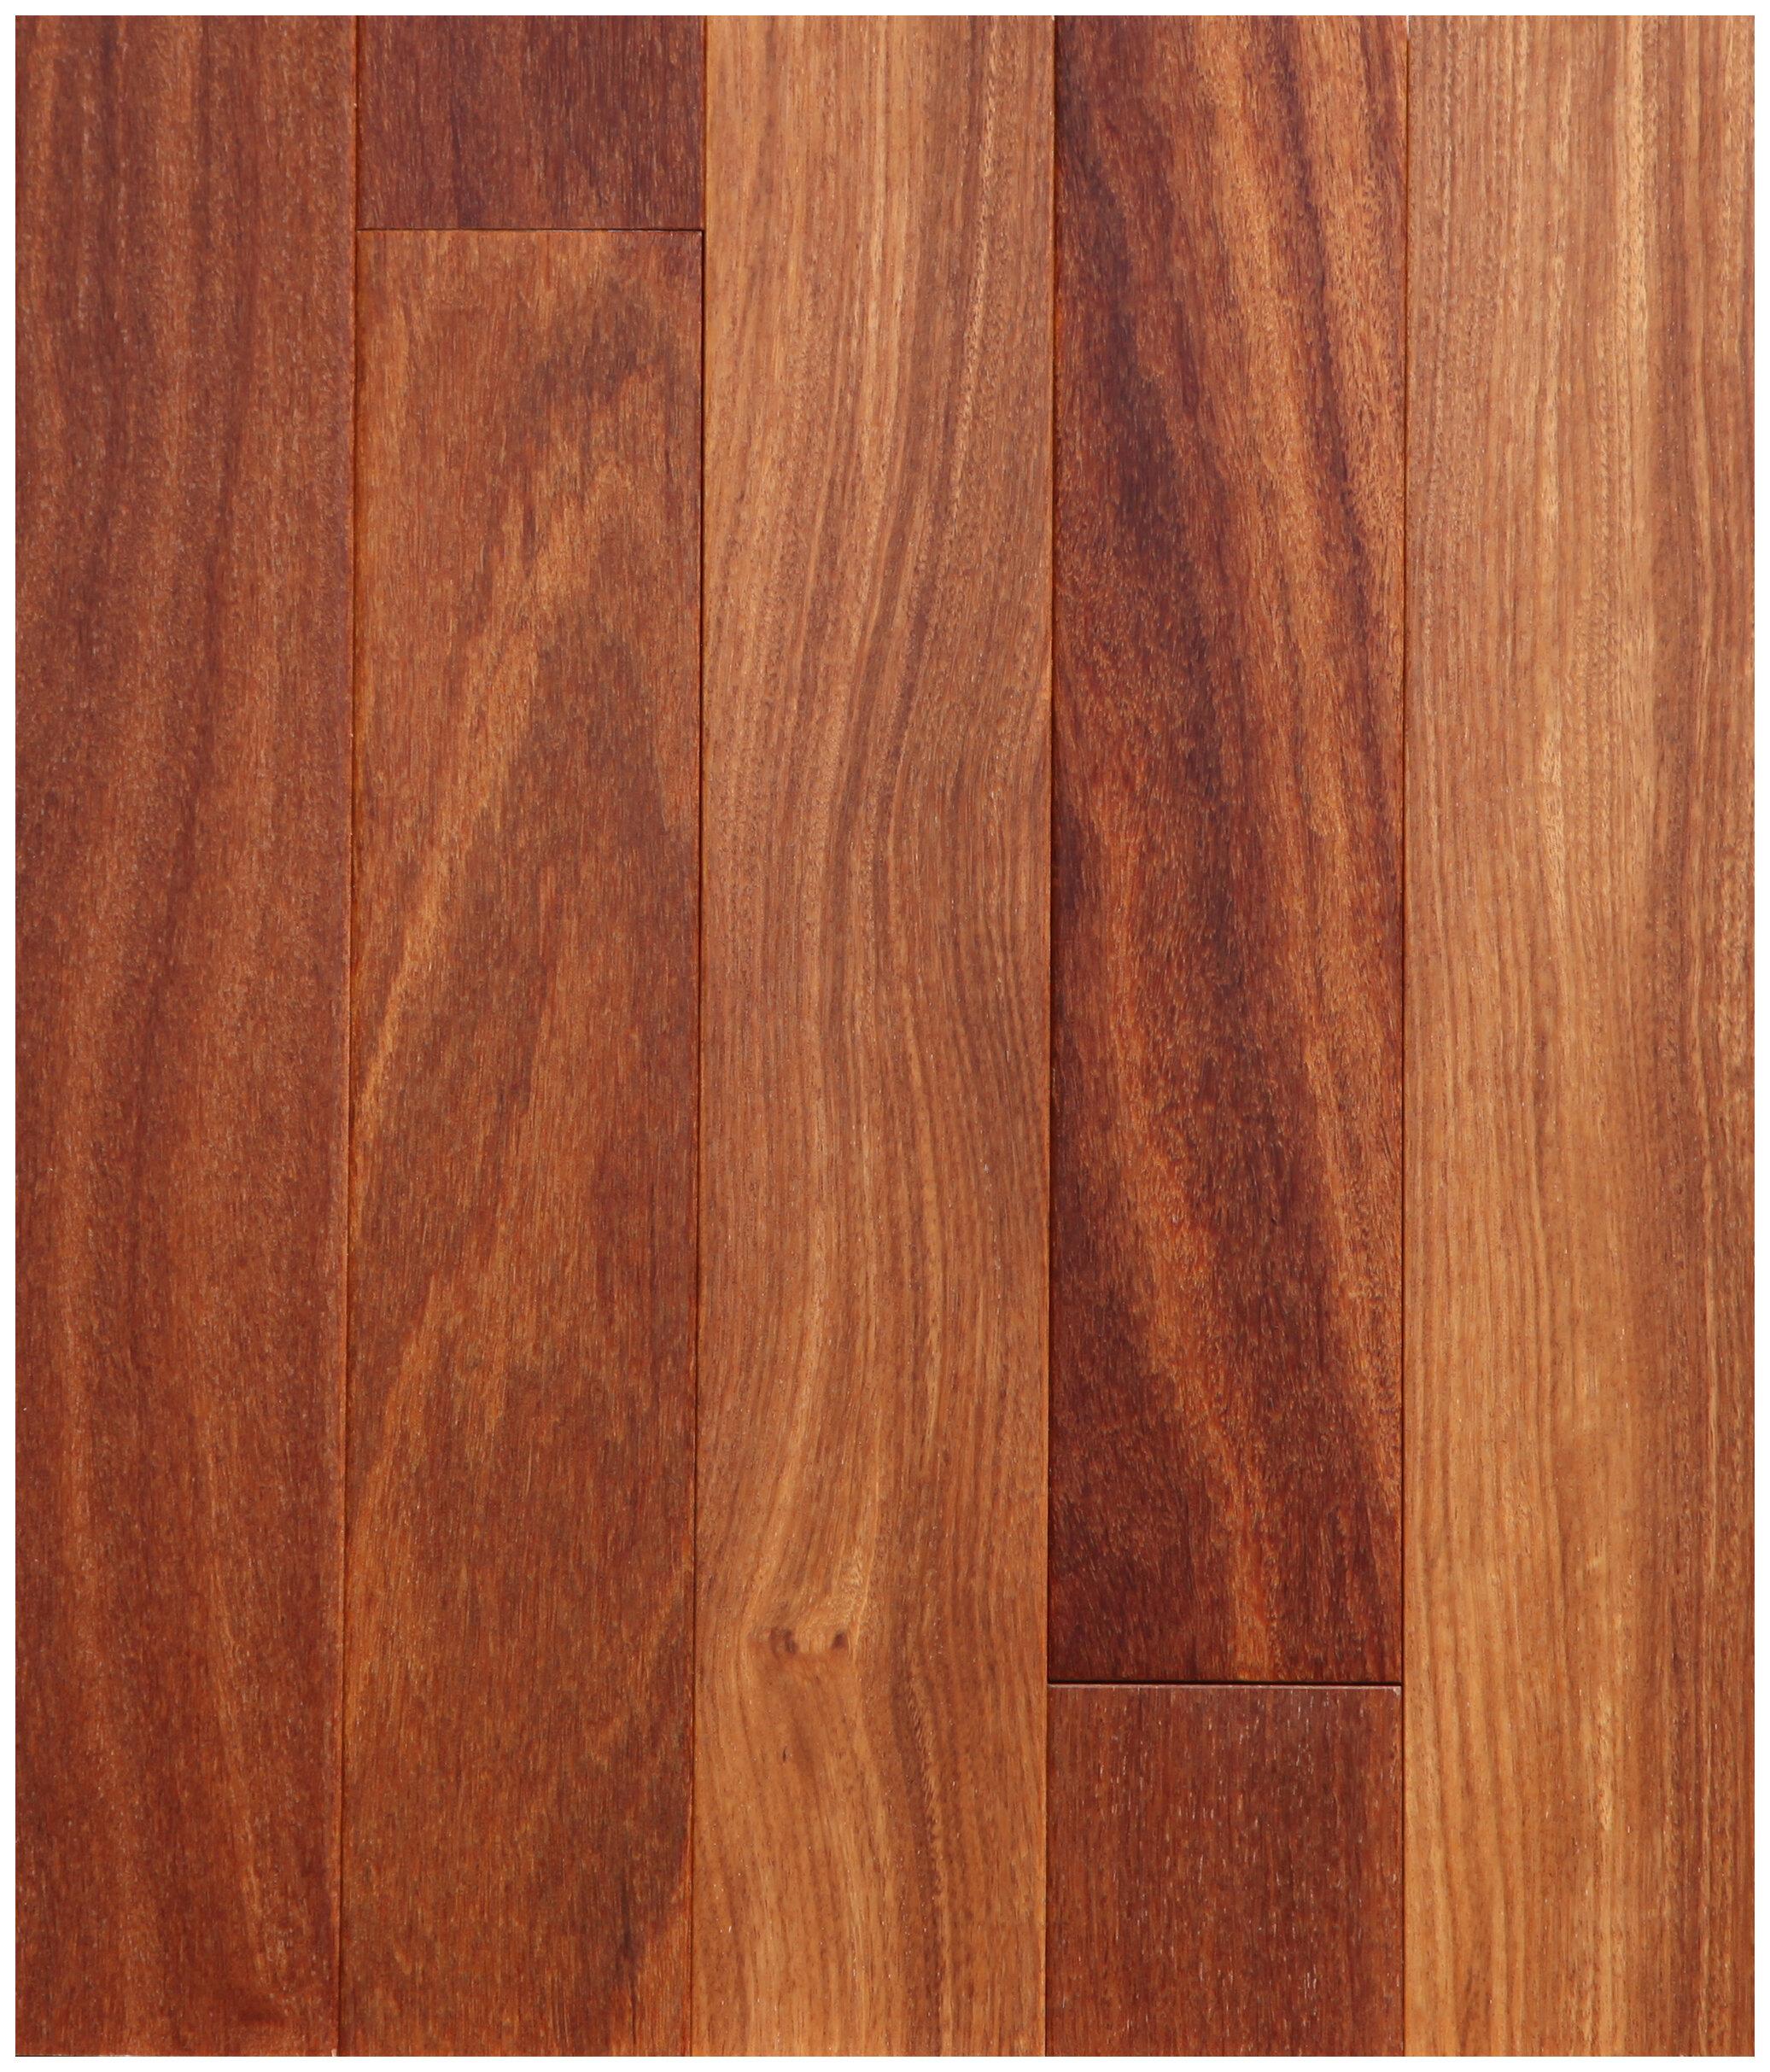 hardwood finished san img brazilian factory jose cherry flooring walnut installation floors